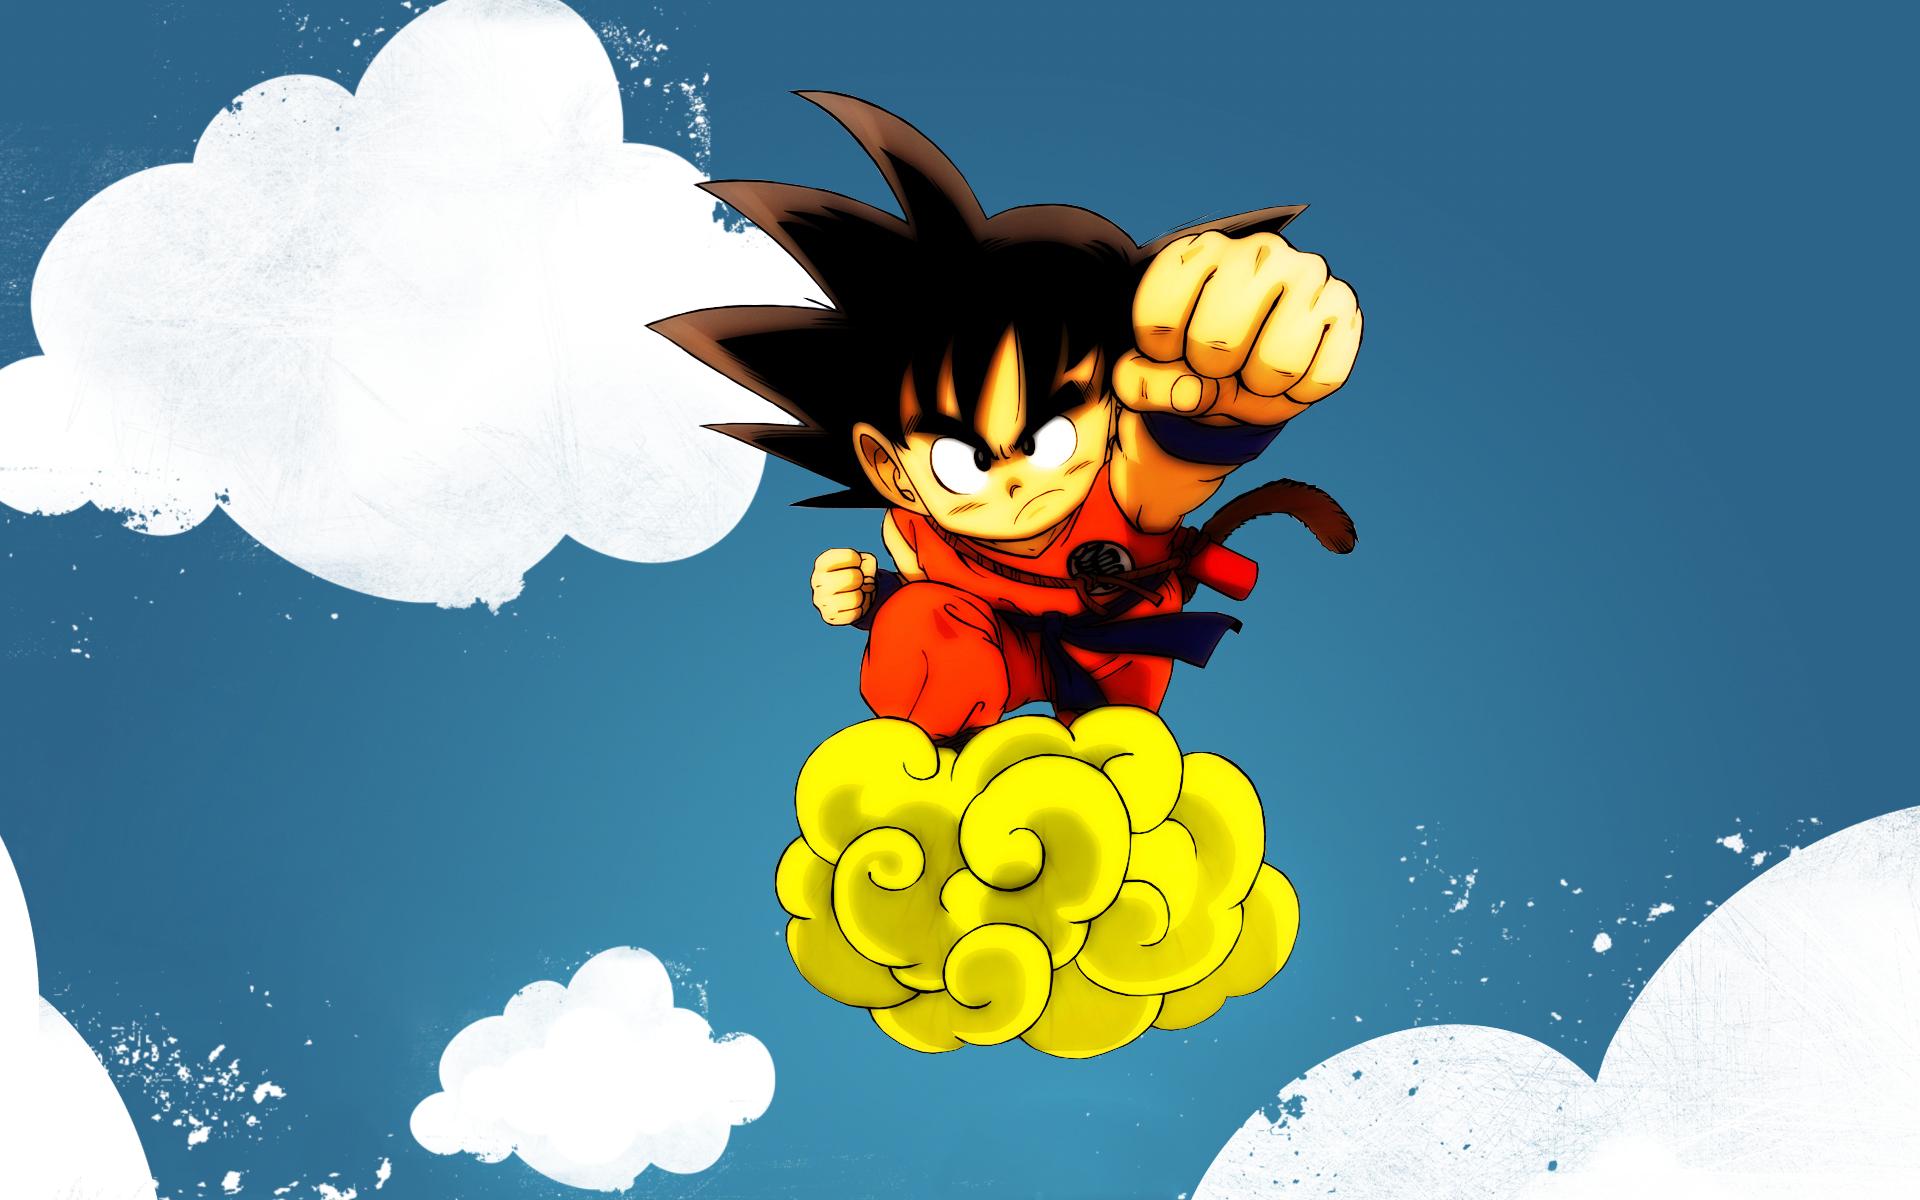 Goku Nimbus Cloud by MeSuperNinja on DeviantArt